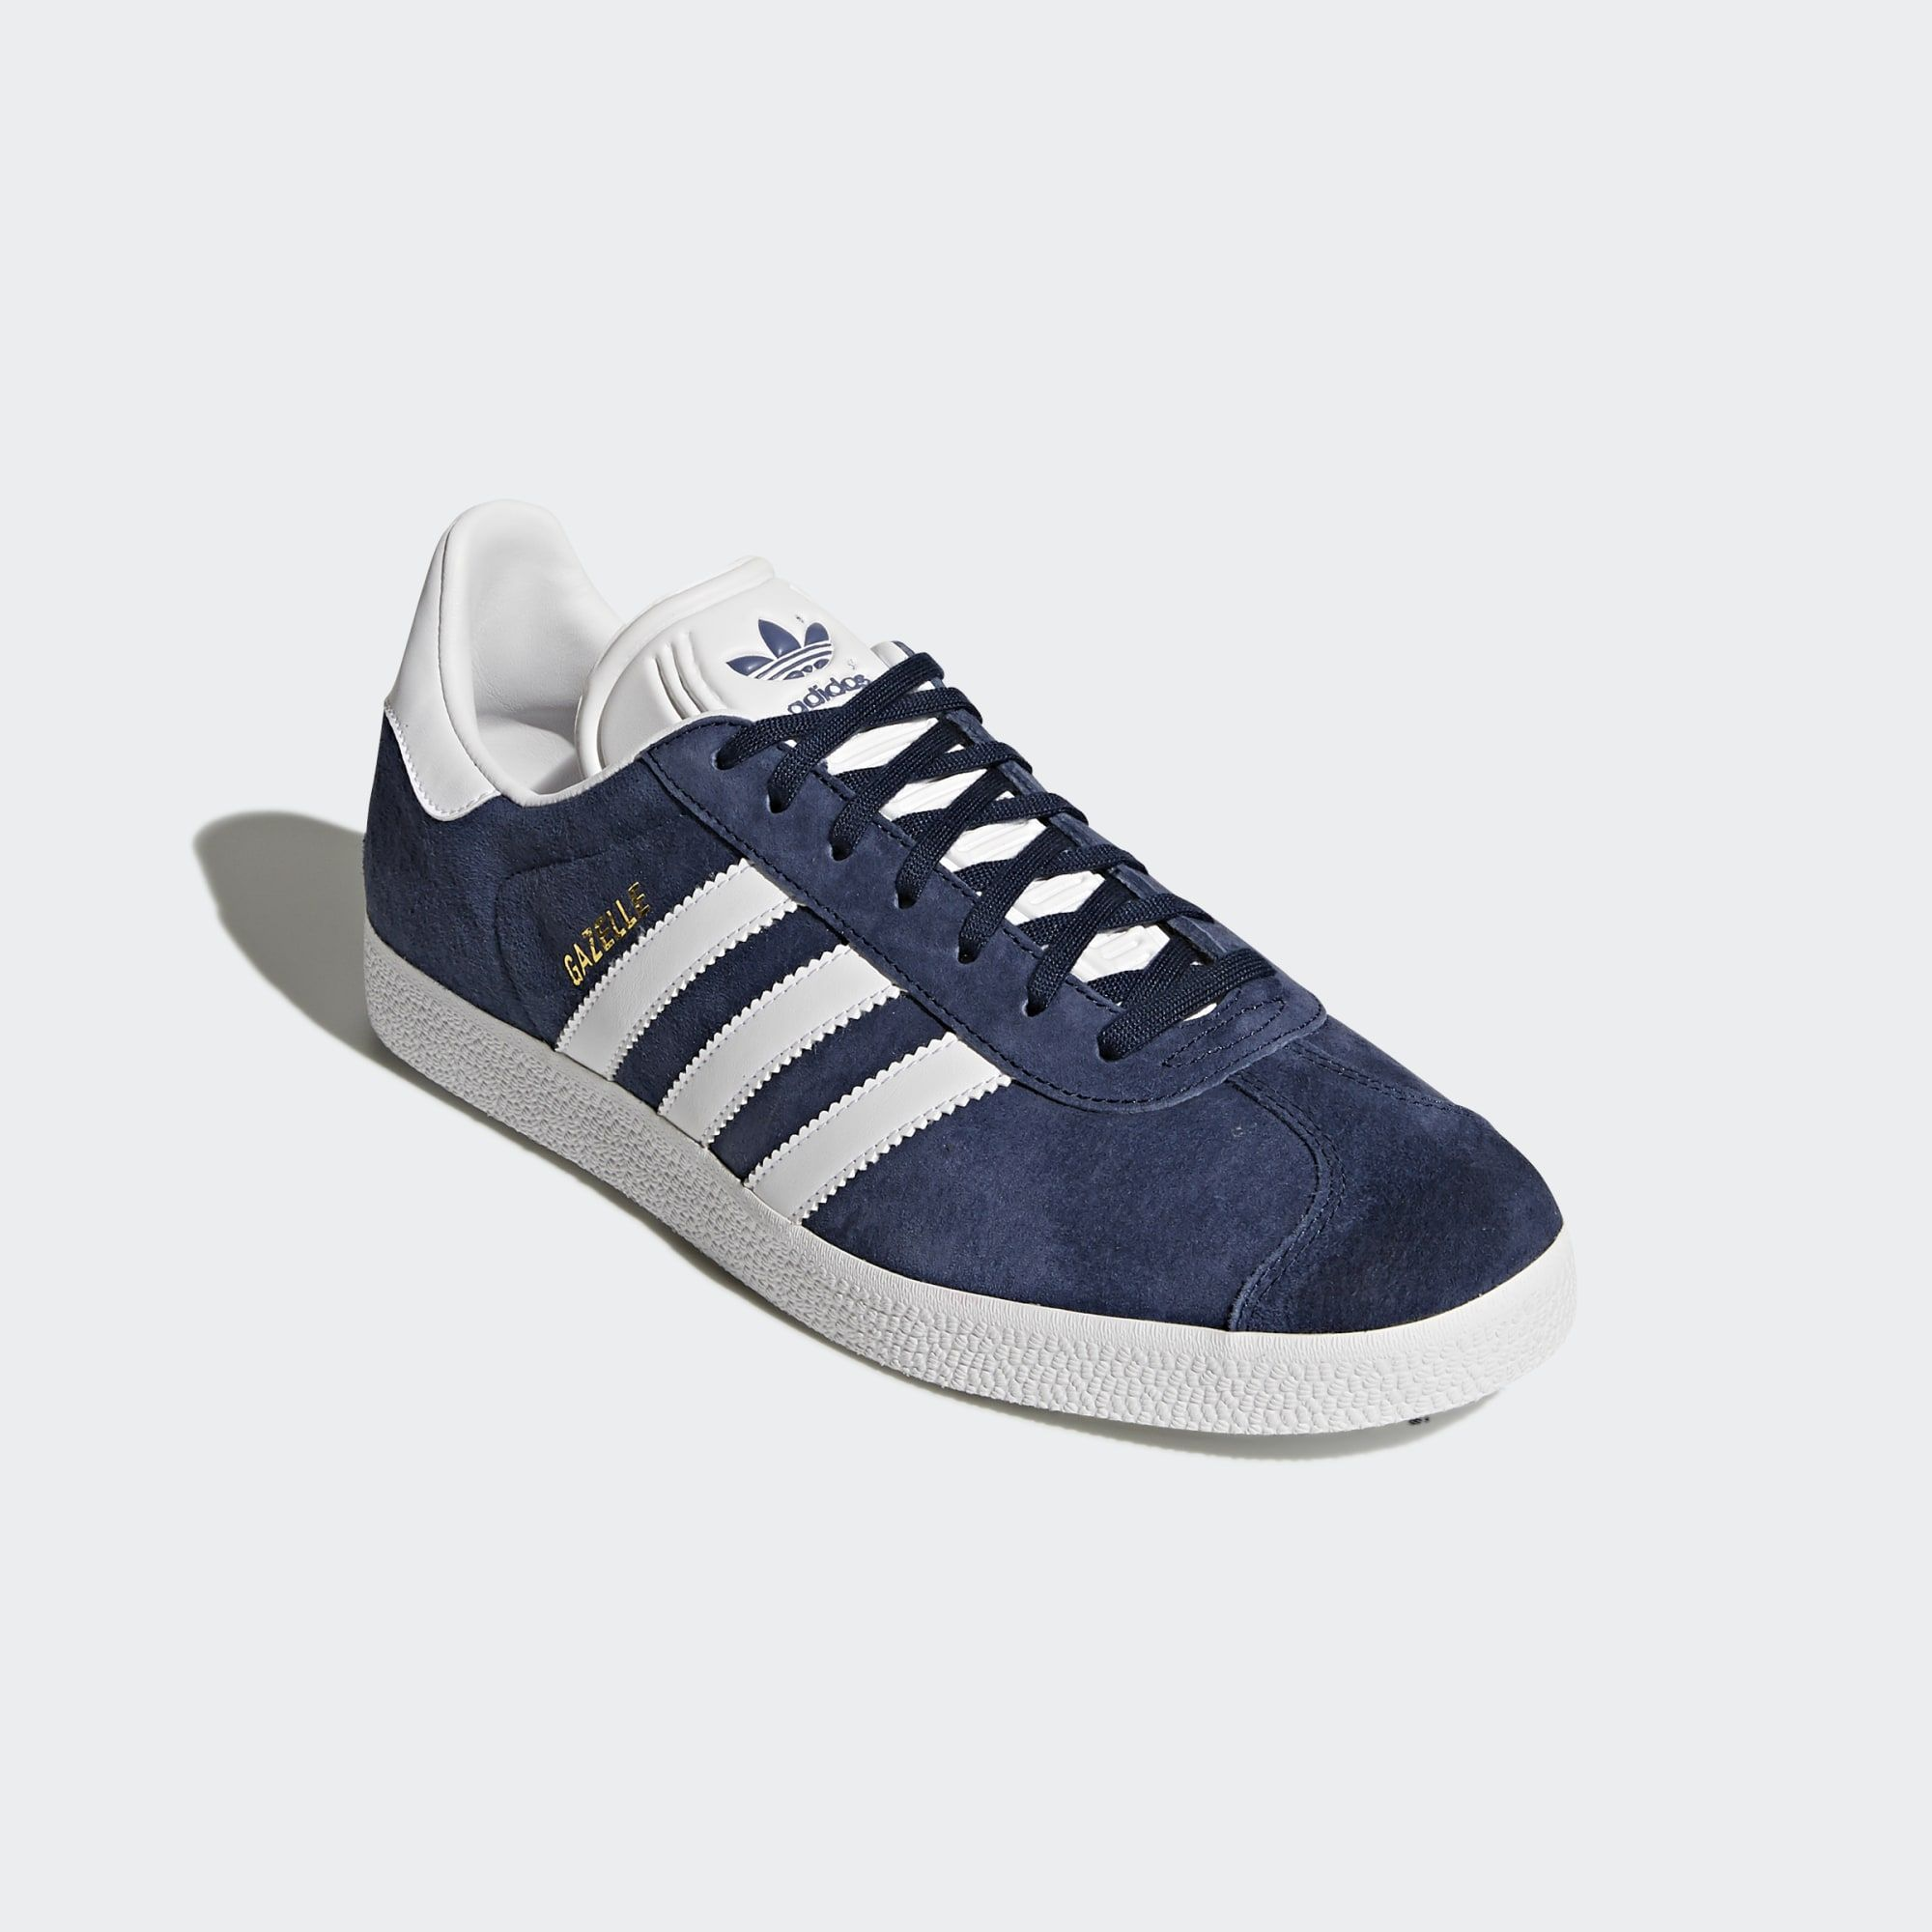 Adidas Gazelle Shoes Blue Adidas Us In 2021 Sneakers Men Fashion Blue Adidas Boots Men